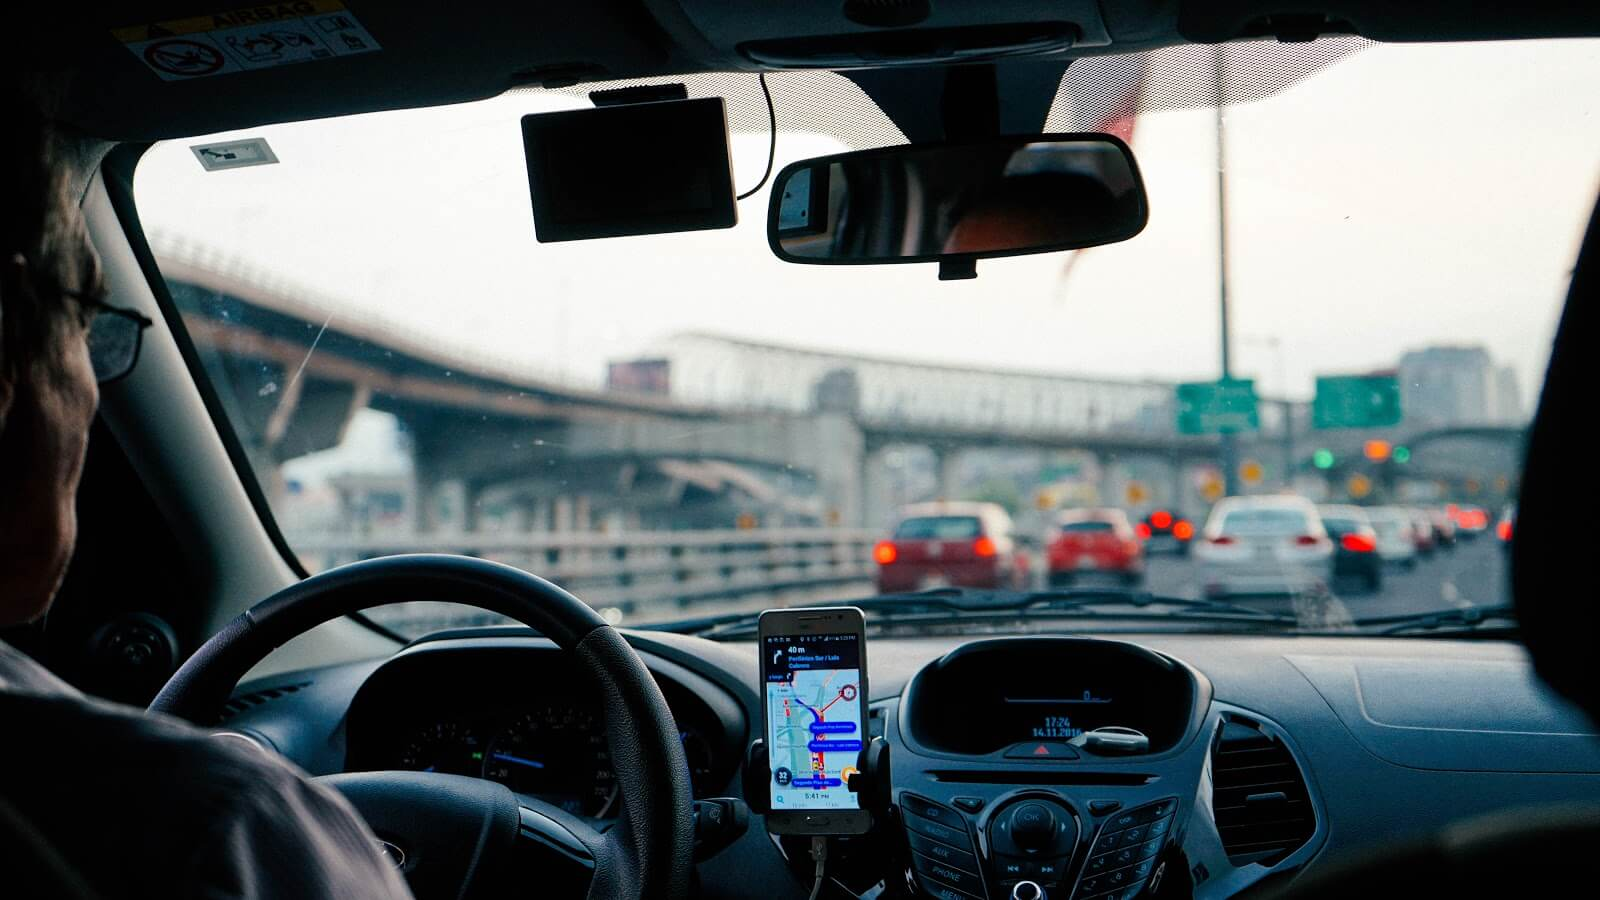 UberPool driver